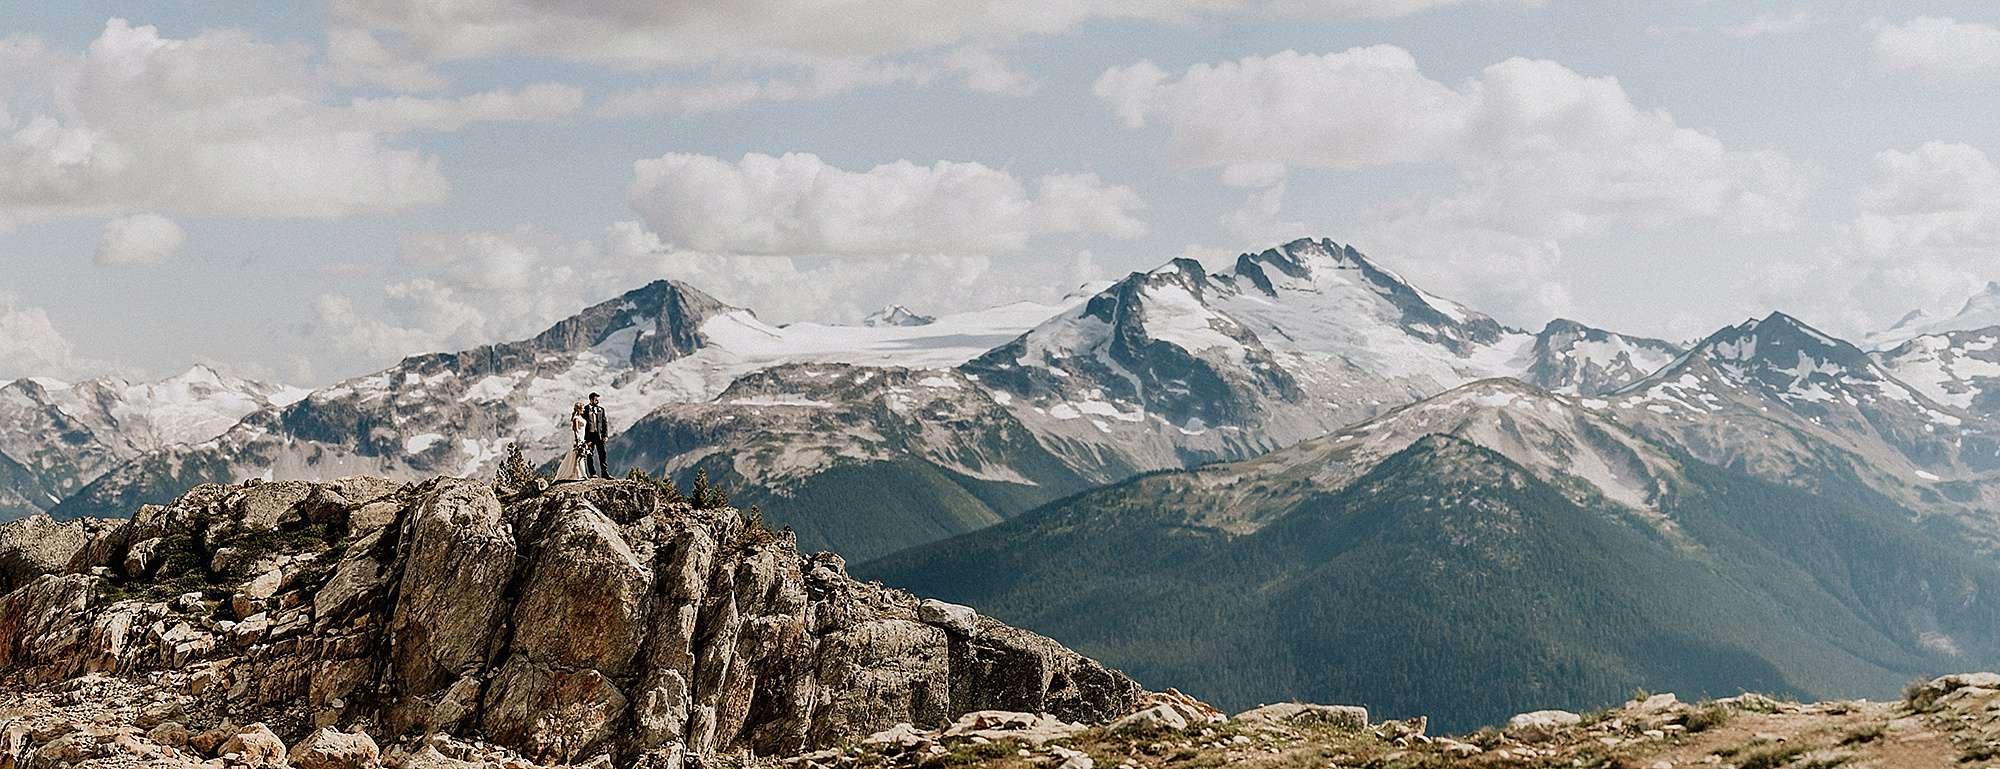 wedding couple on mountain top whistler bc